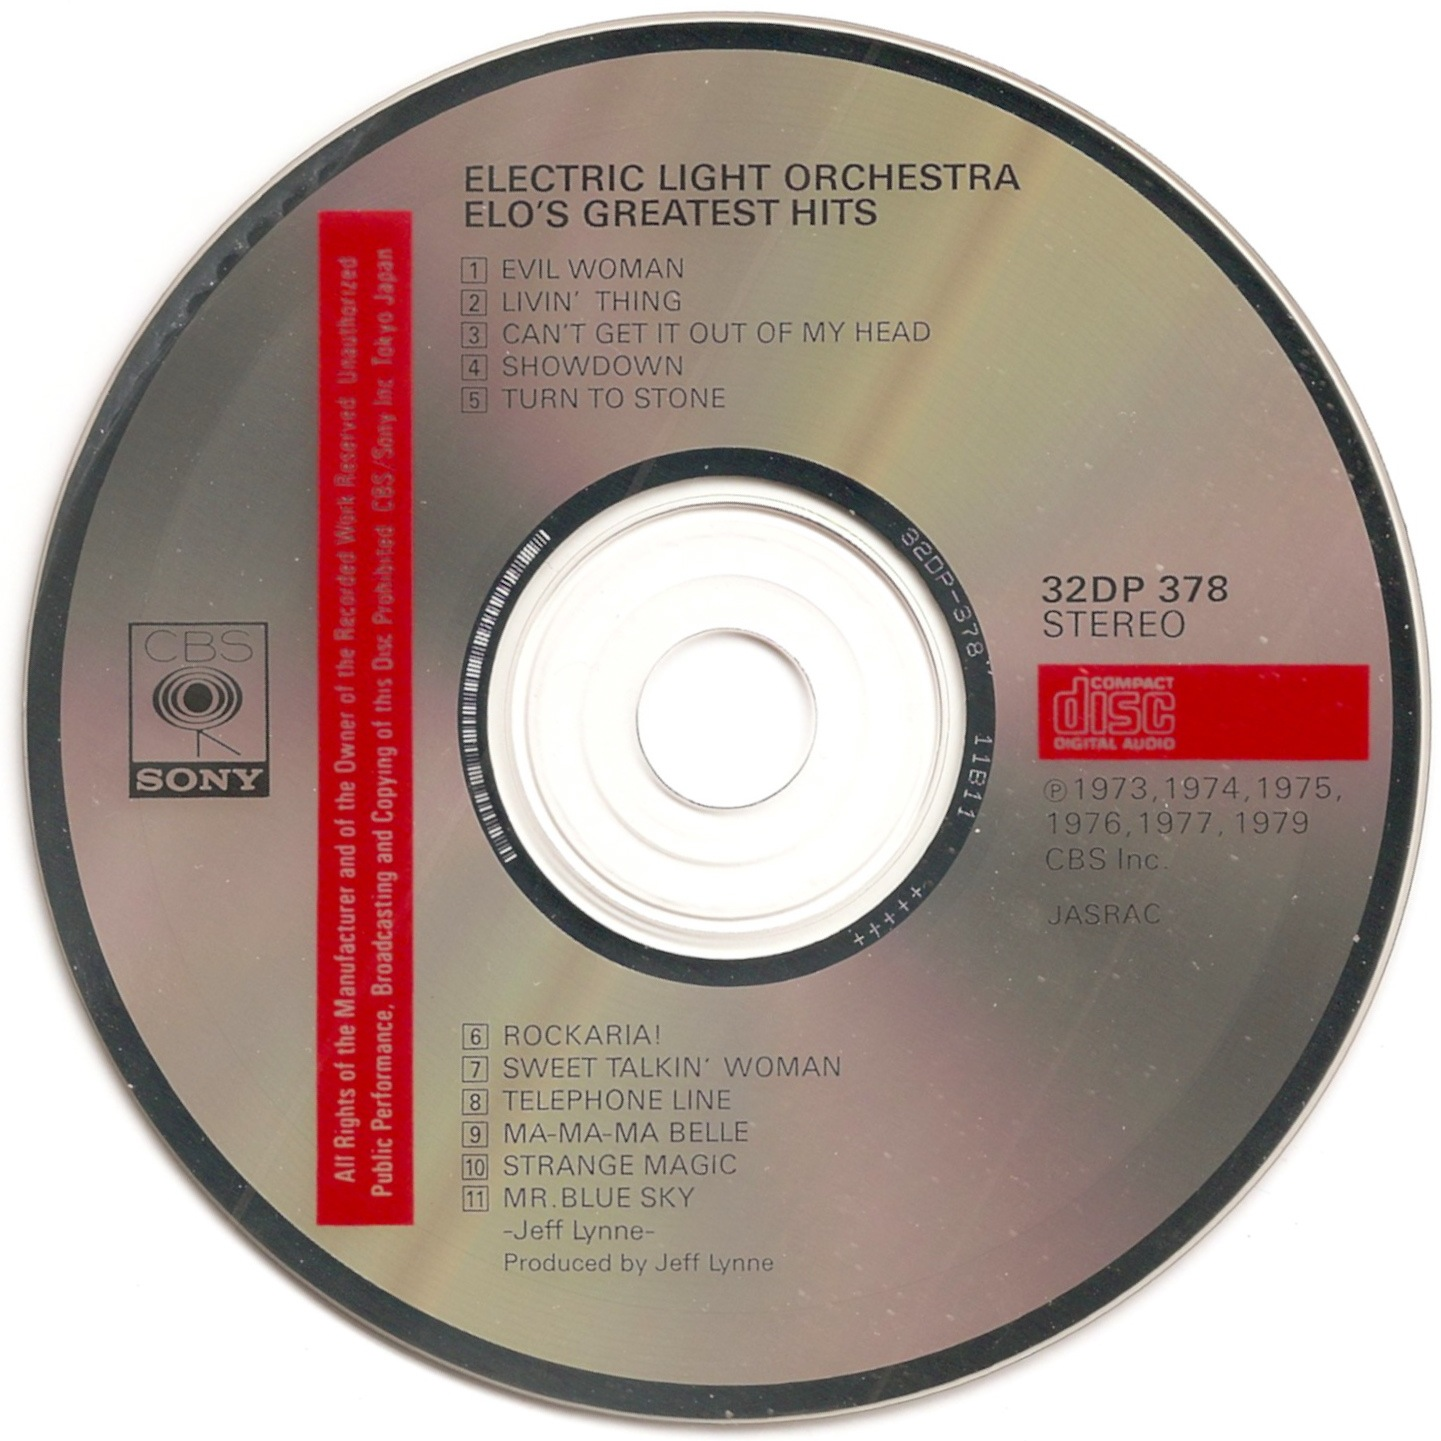 Sade - Greatest Hits 2001